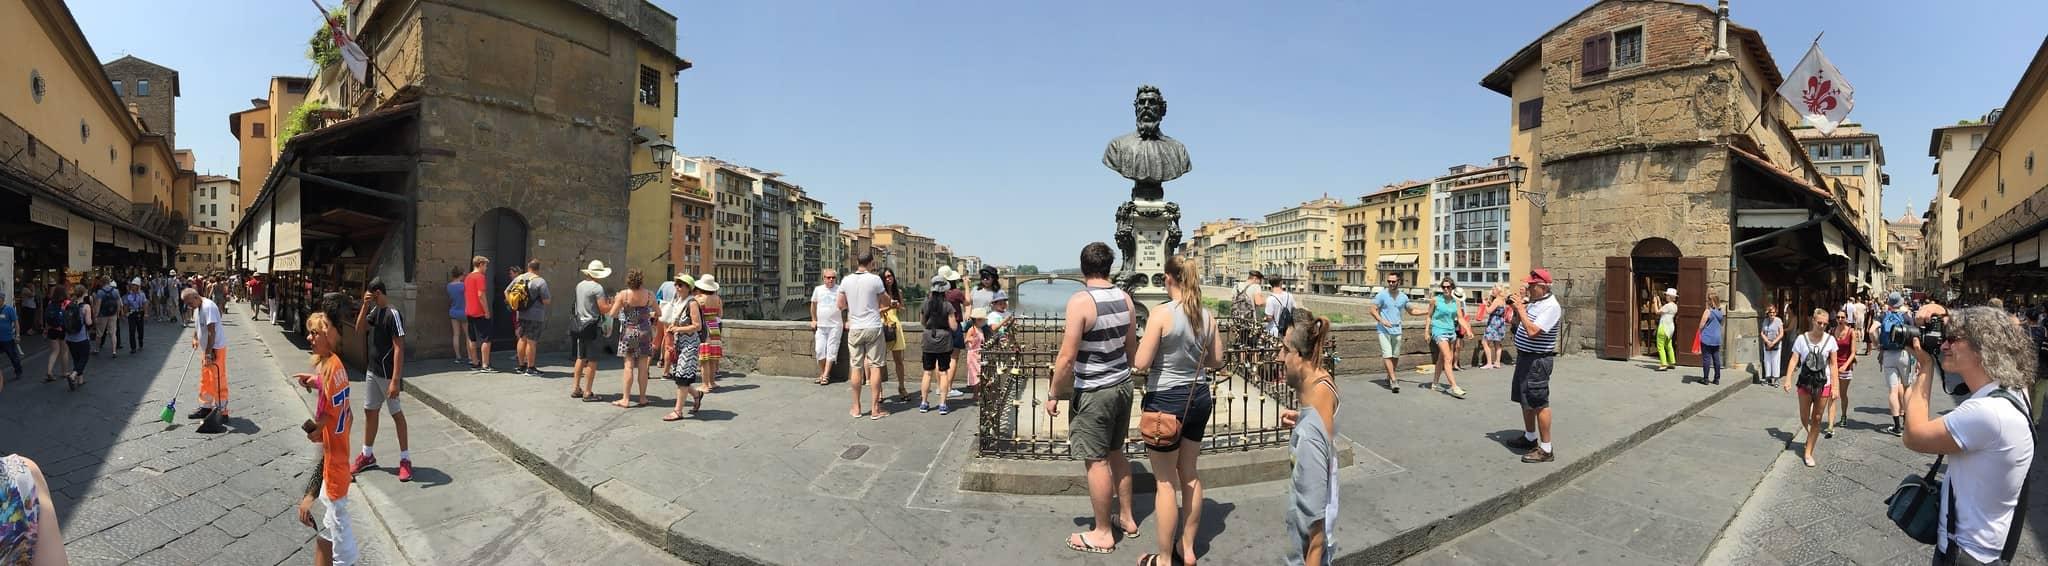 Ponte Vecchio Floransa (Eski Köprü)